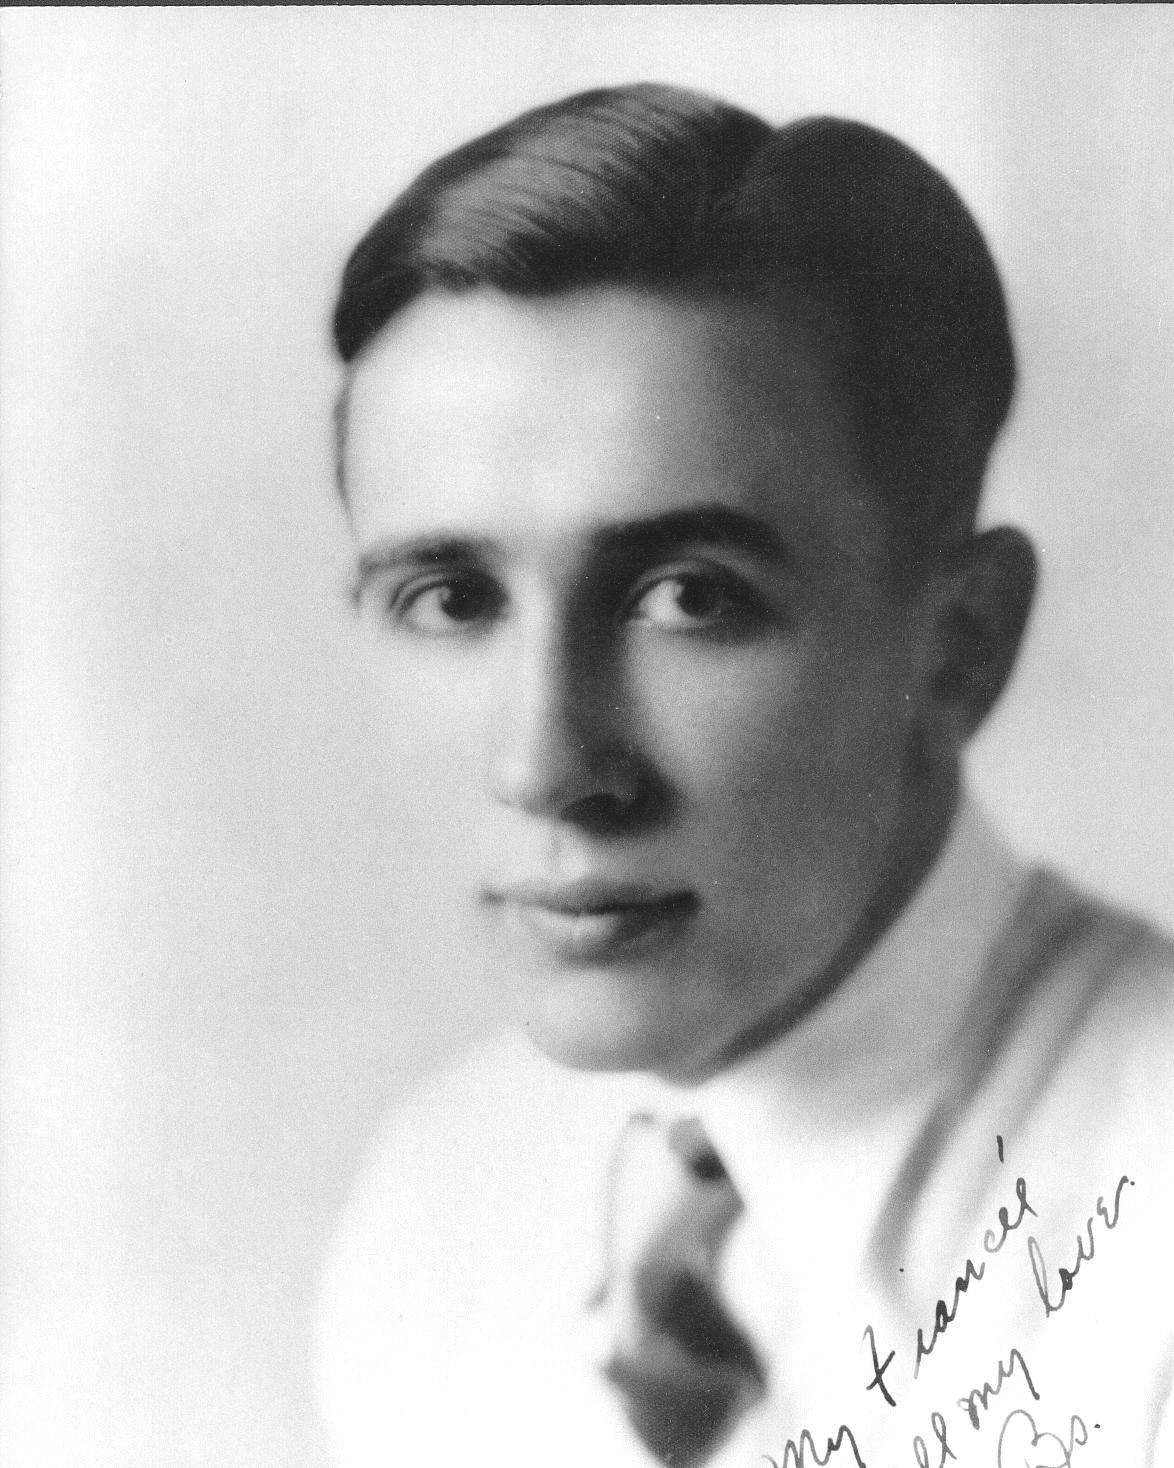 Robert Mensinger